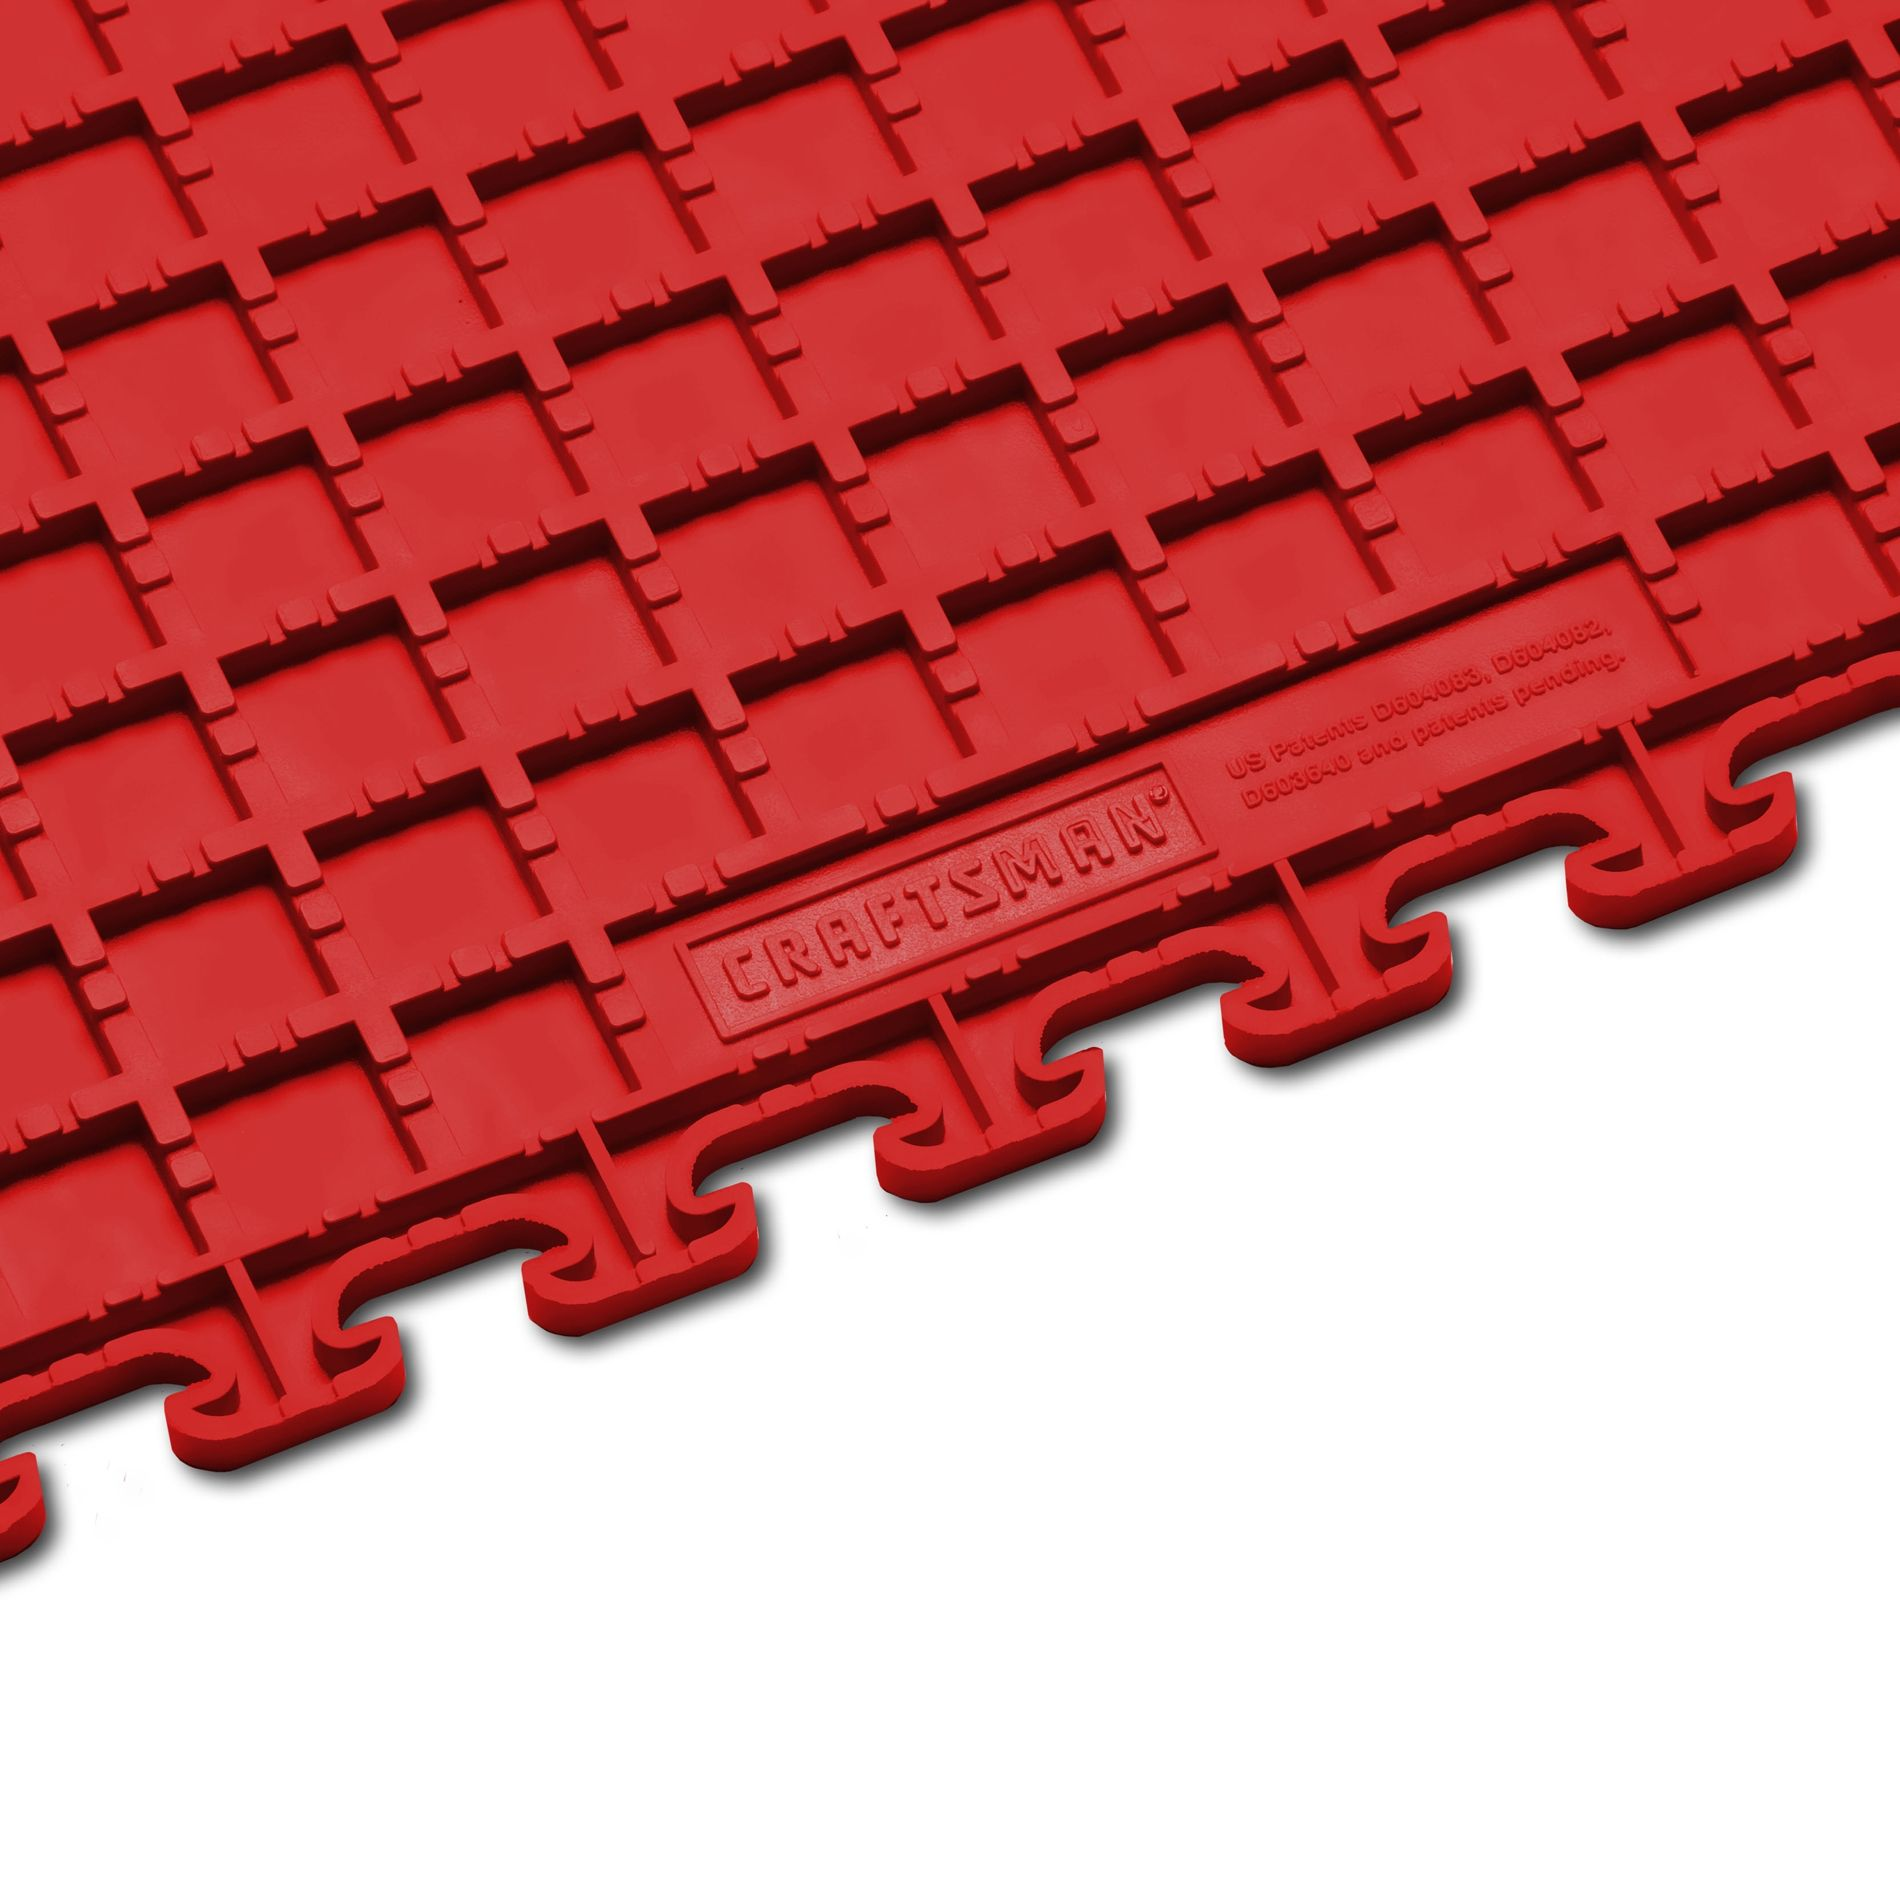 Craftsman Red PVC Multi-Purpose Raised Coin Garage Flooring